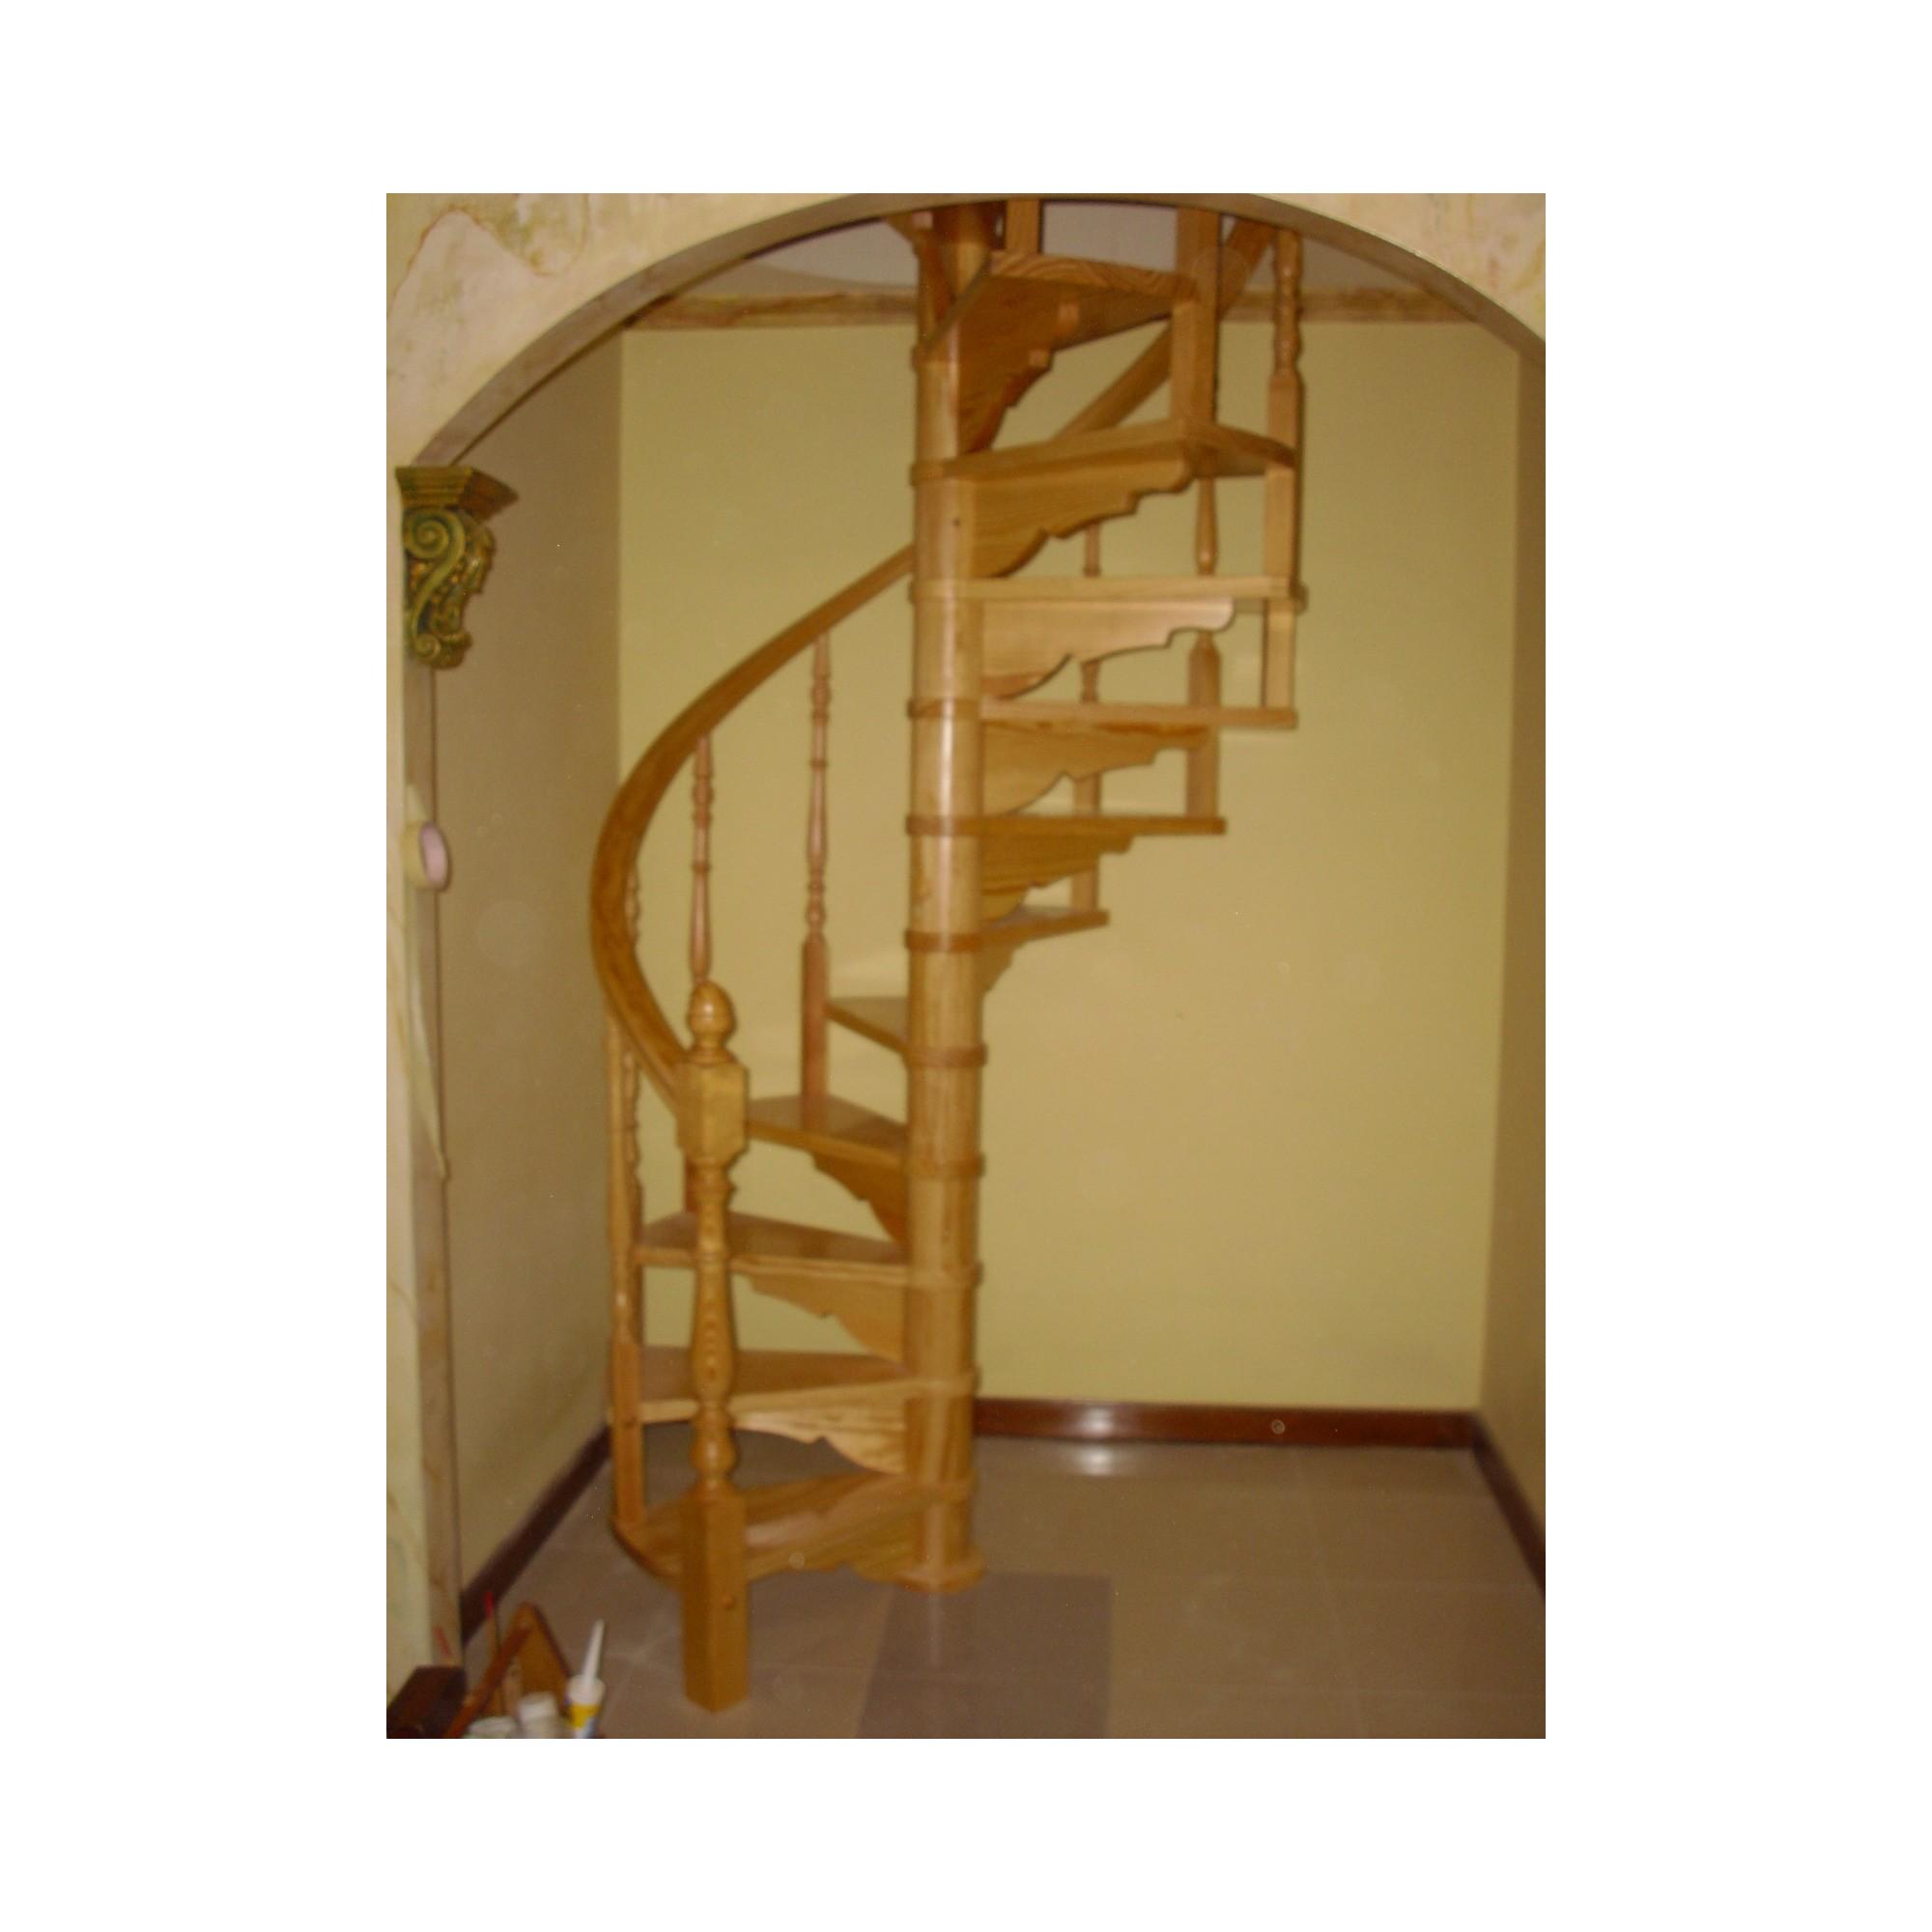 Escalera caracol interior a medida modelo jan - Madera a medida ...